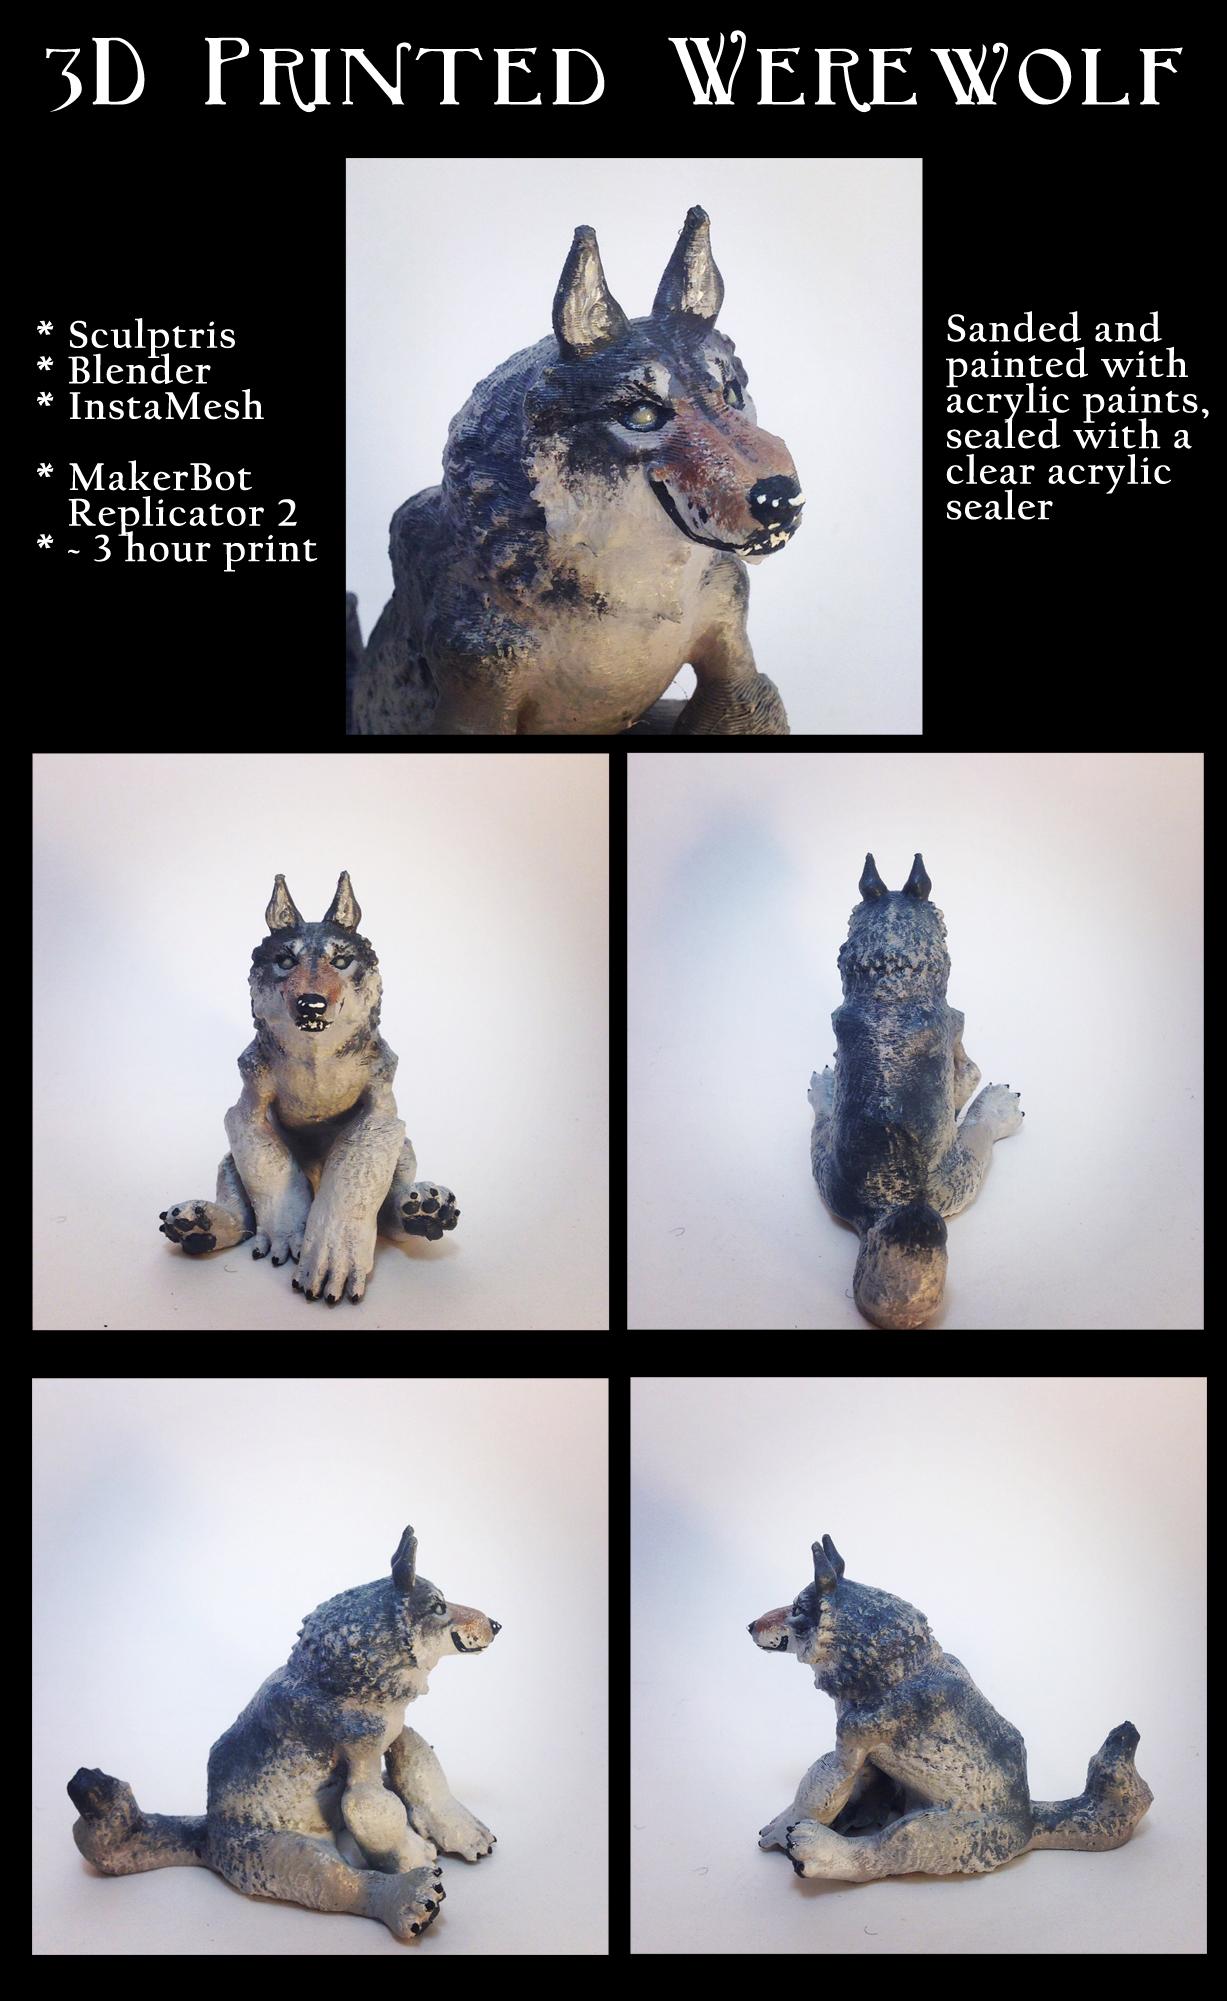 3D Printed Werewolf by RRedolfi